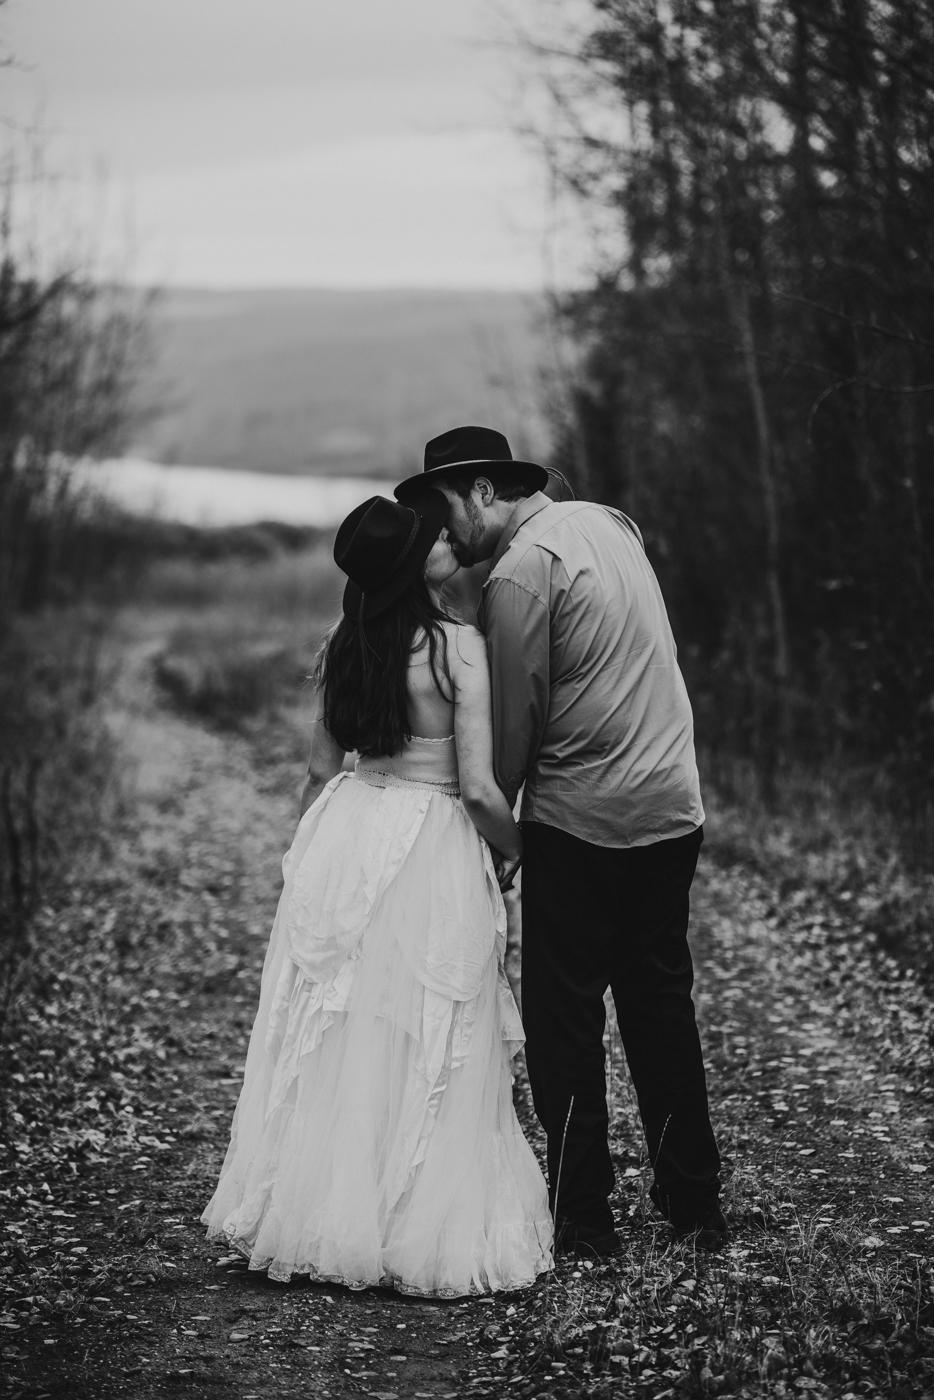 FortSt.John_photographer_TyraEPhotography_Wedding_Couple_Family_Photograhy_DawsonCreek_Elopement_Bride_Boduoir_Portraits-25.jpg